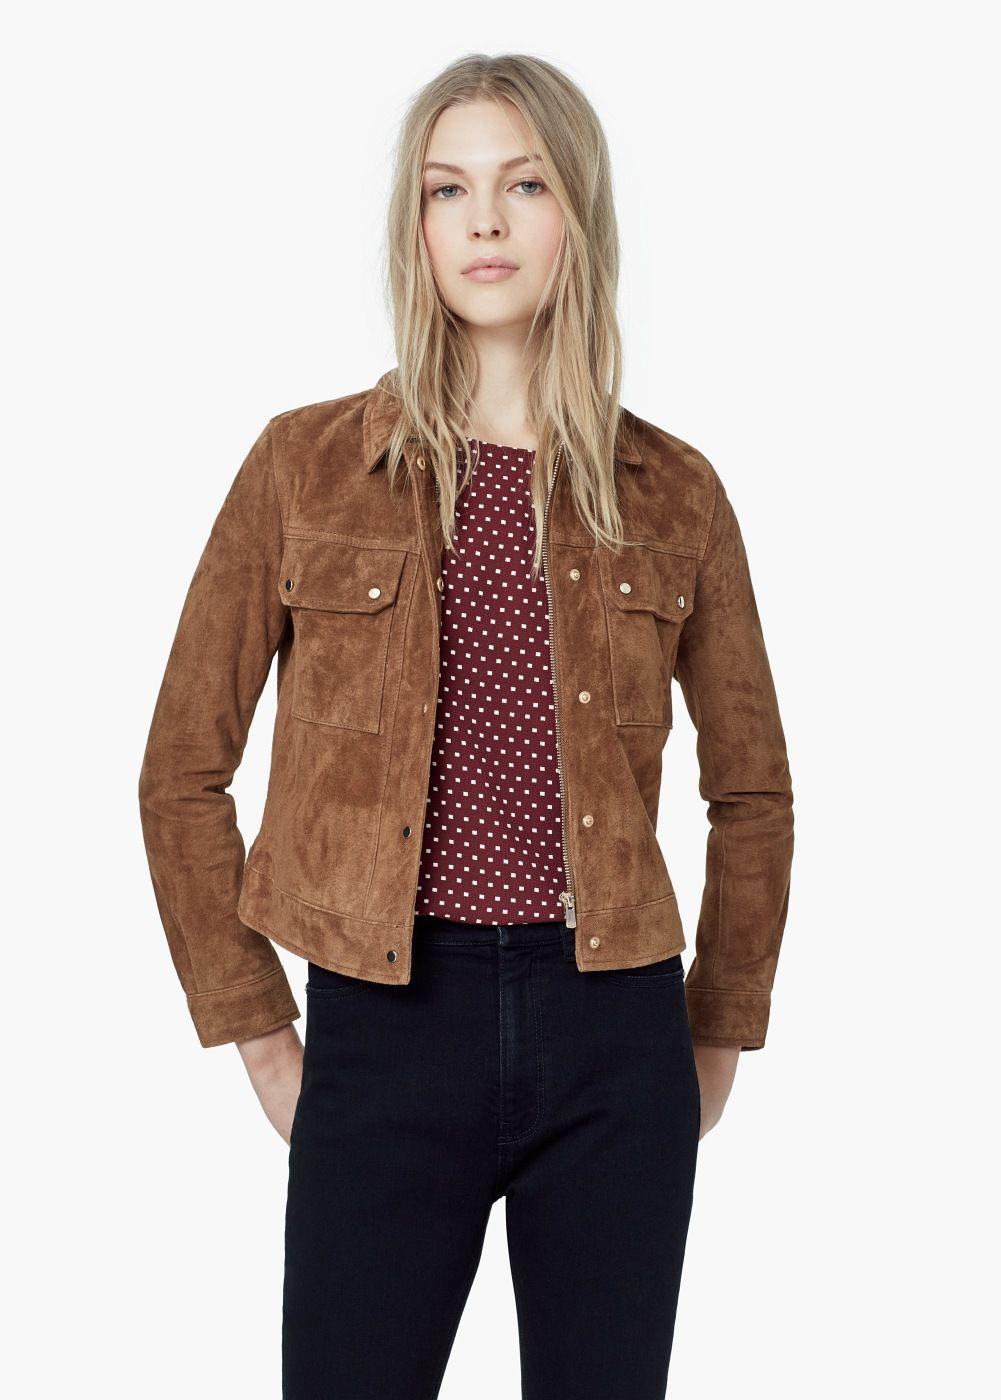 flappocket suede jacket Women Suede jacket, Jackets